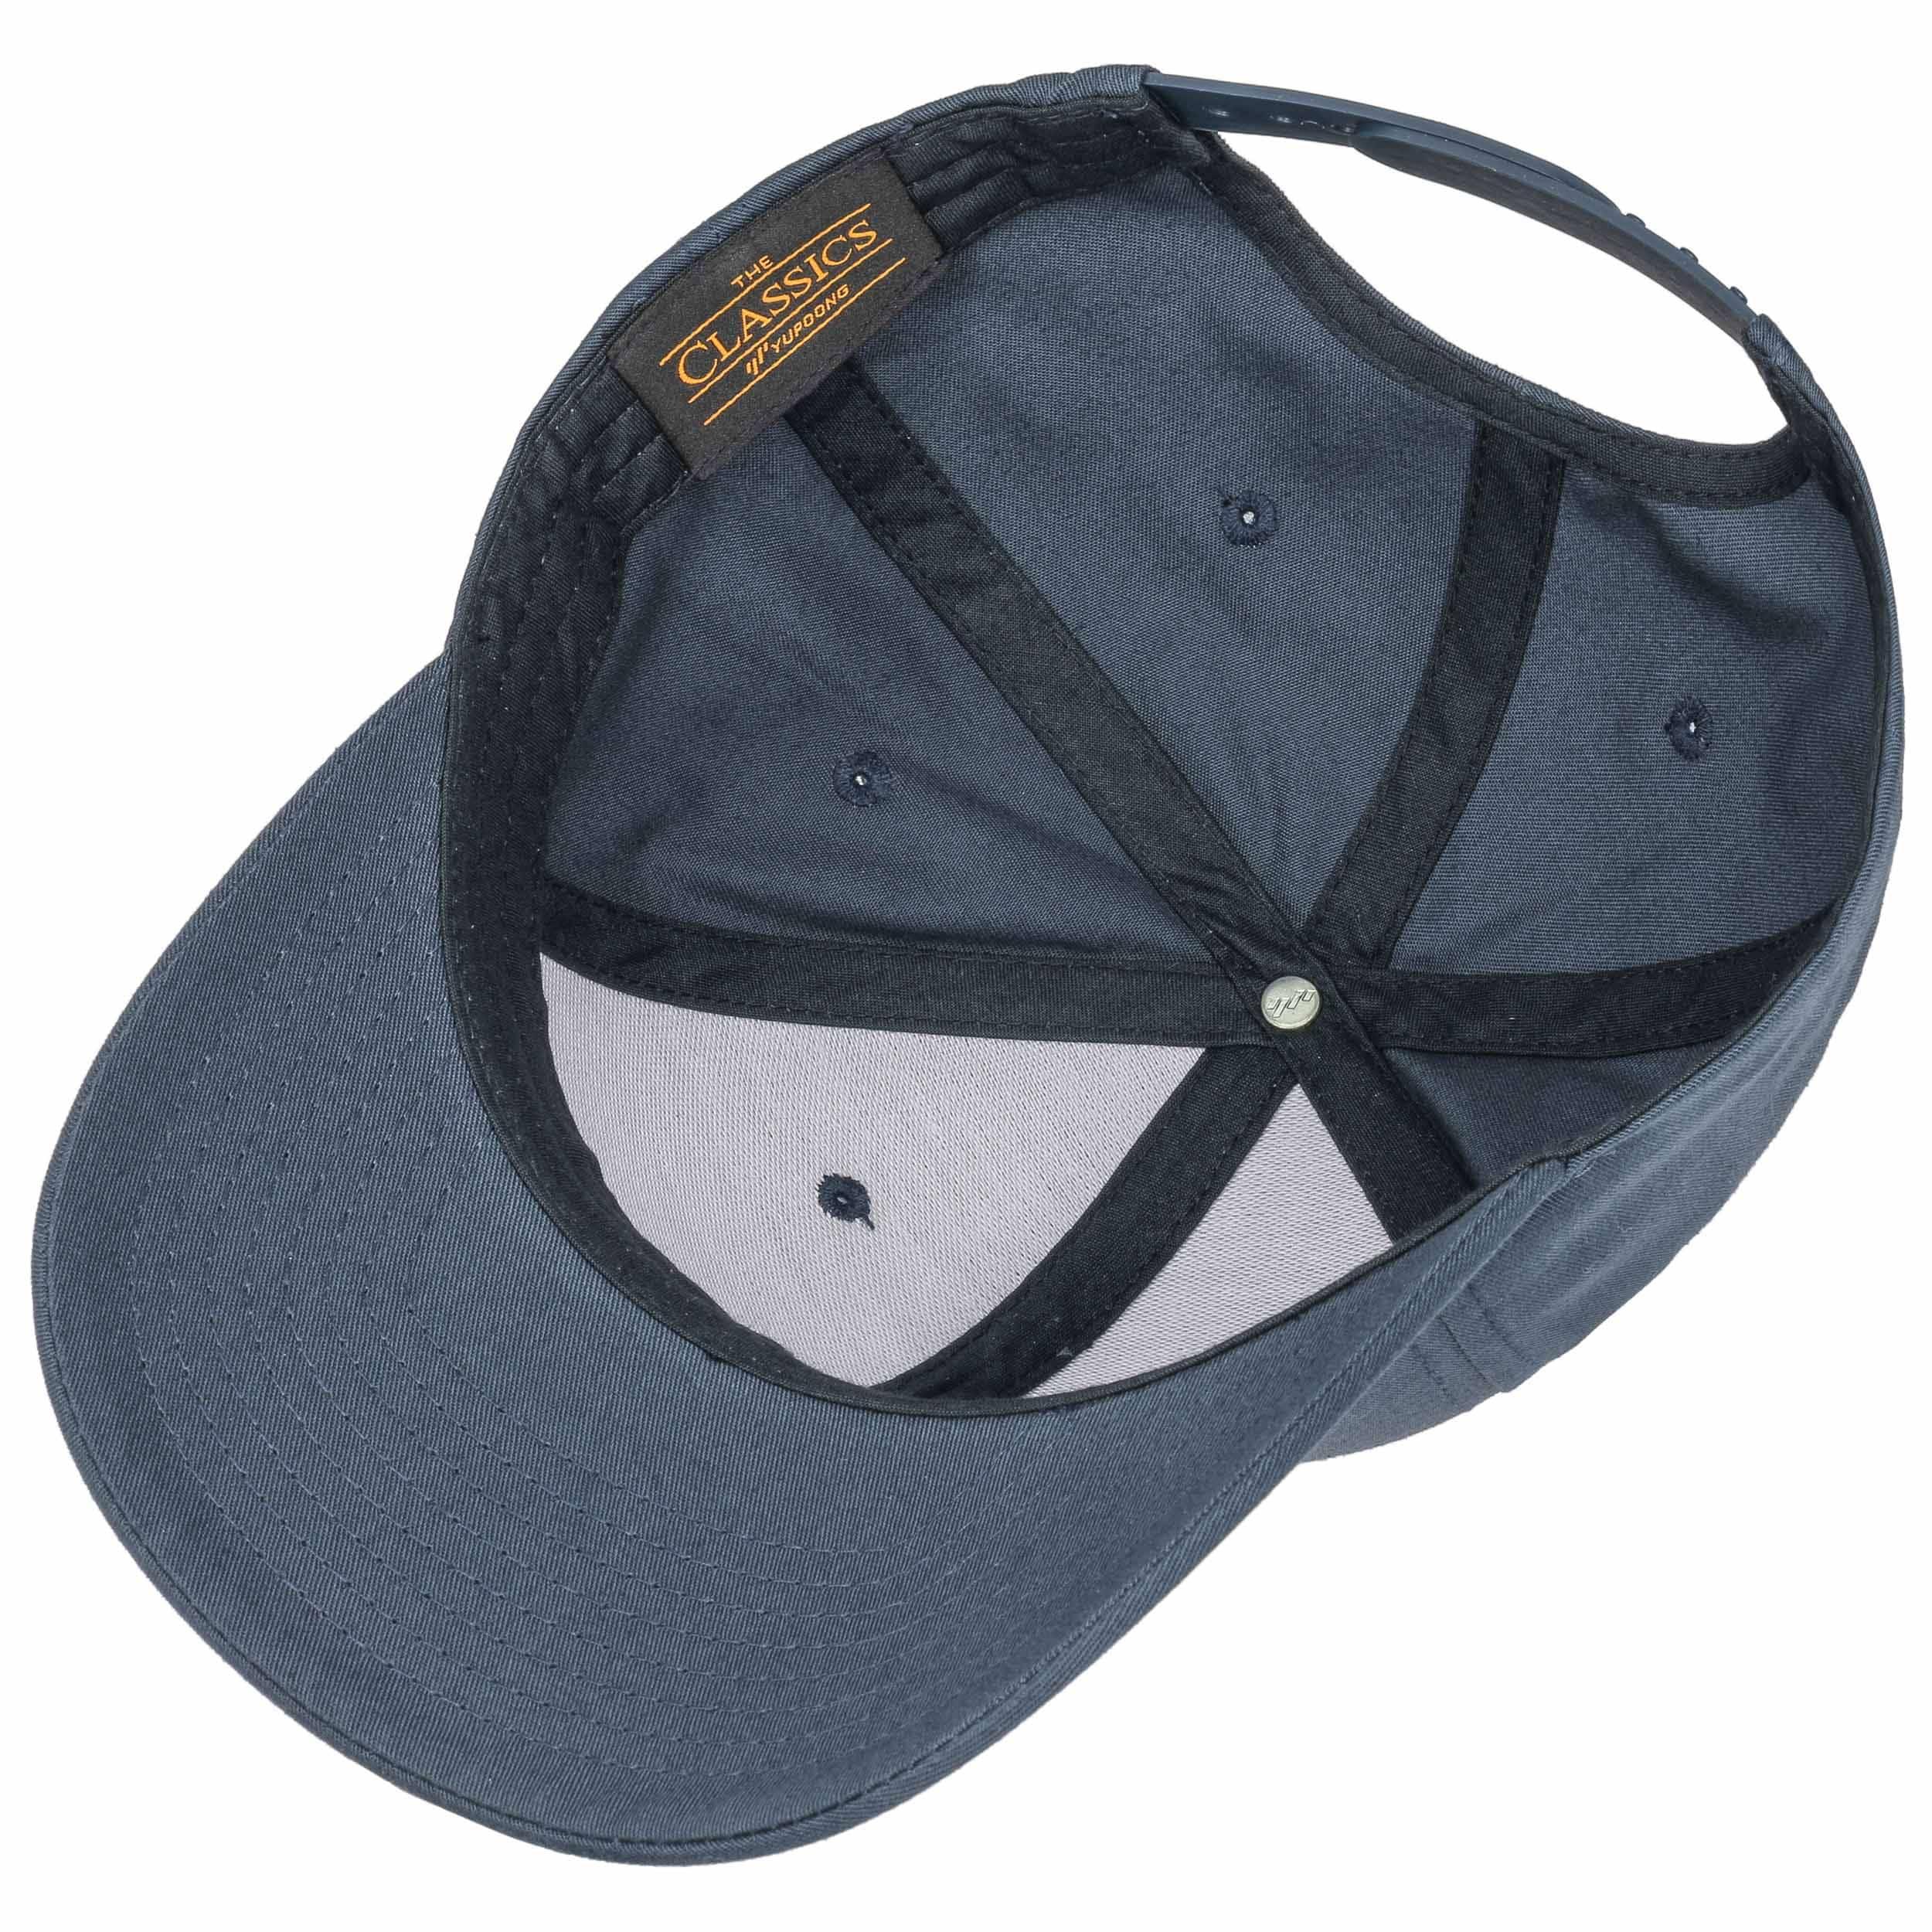 ... Gorra Classic Curved Snapback - azul oscuro 2 ... da106455d88